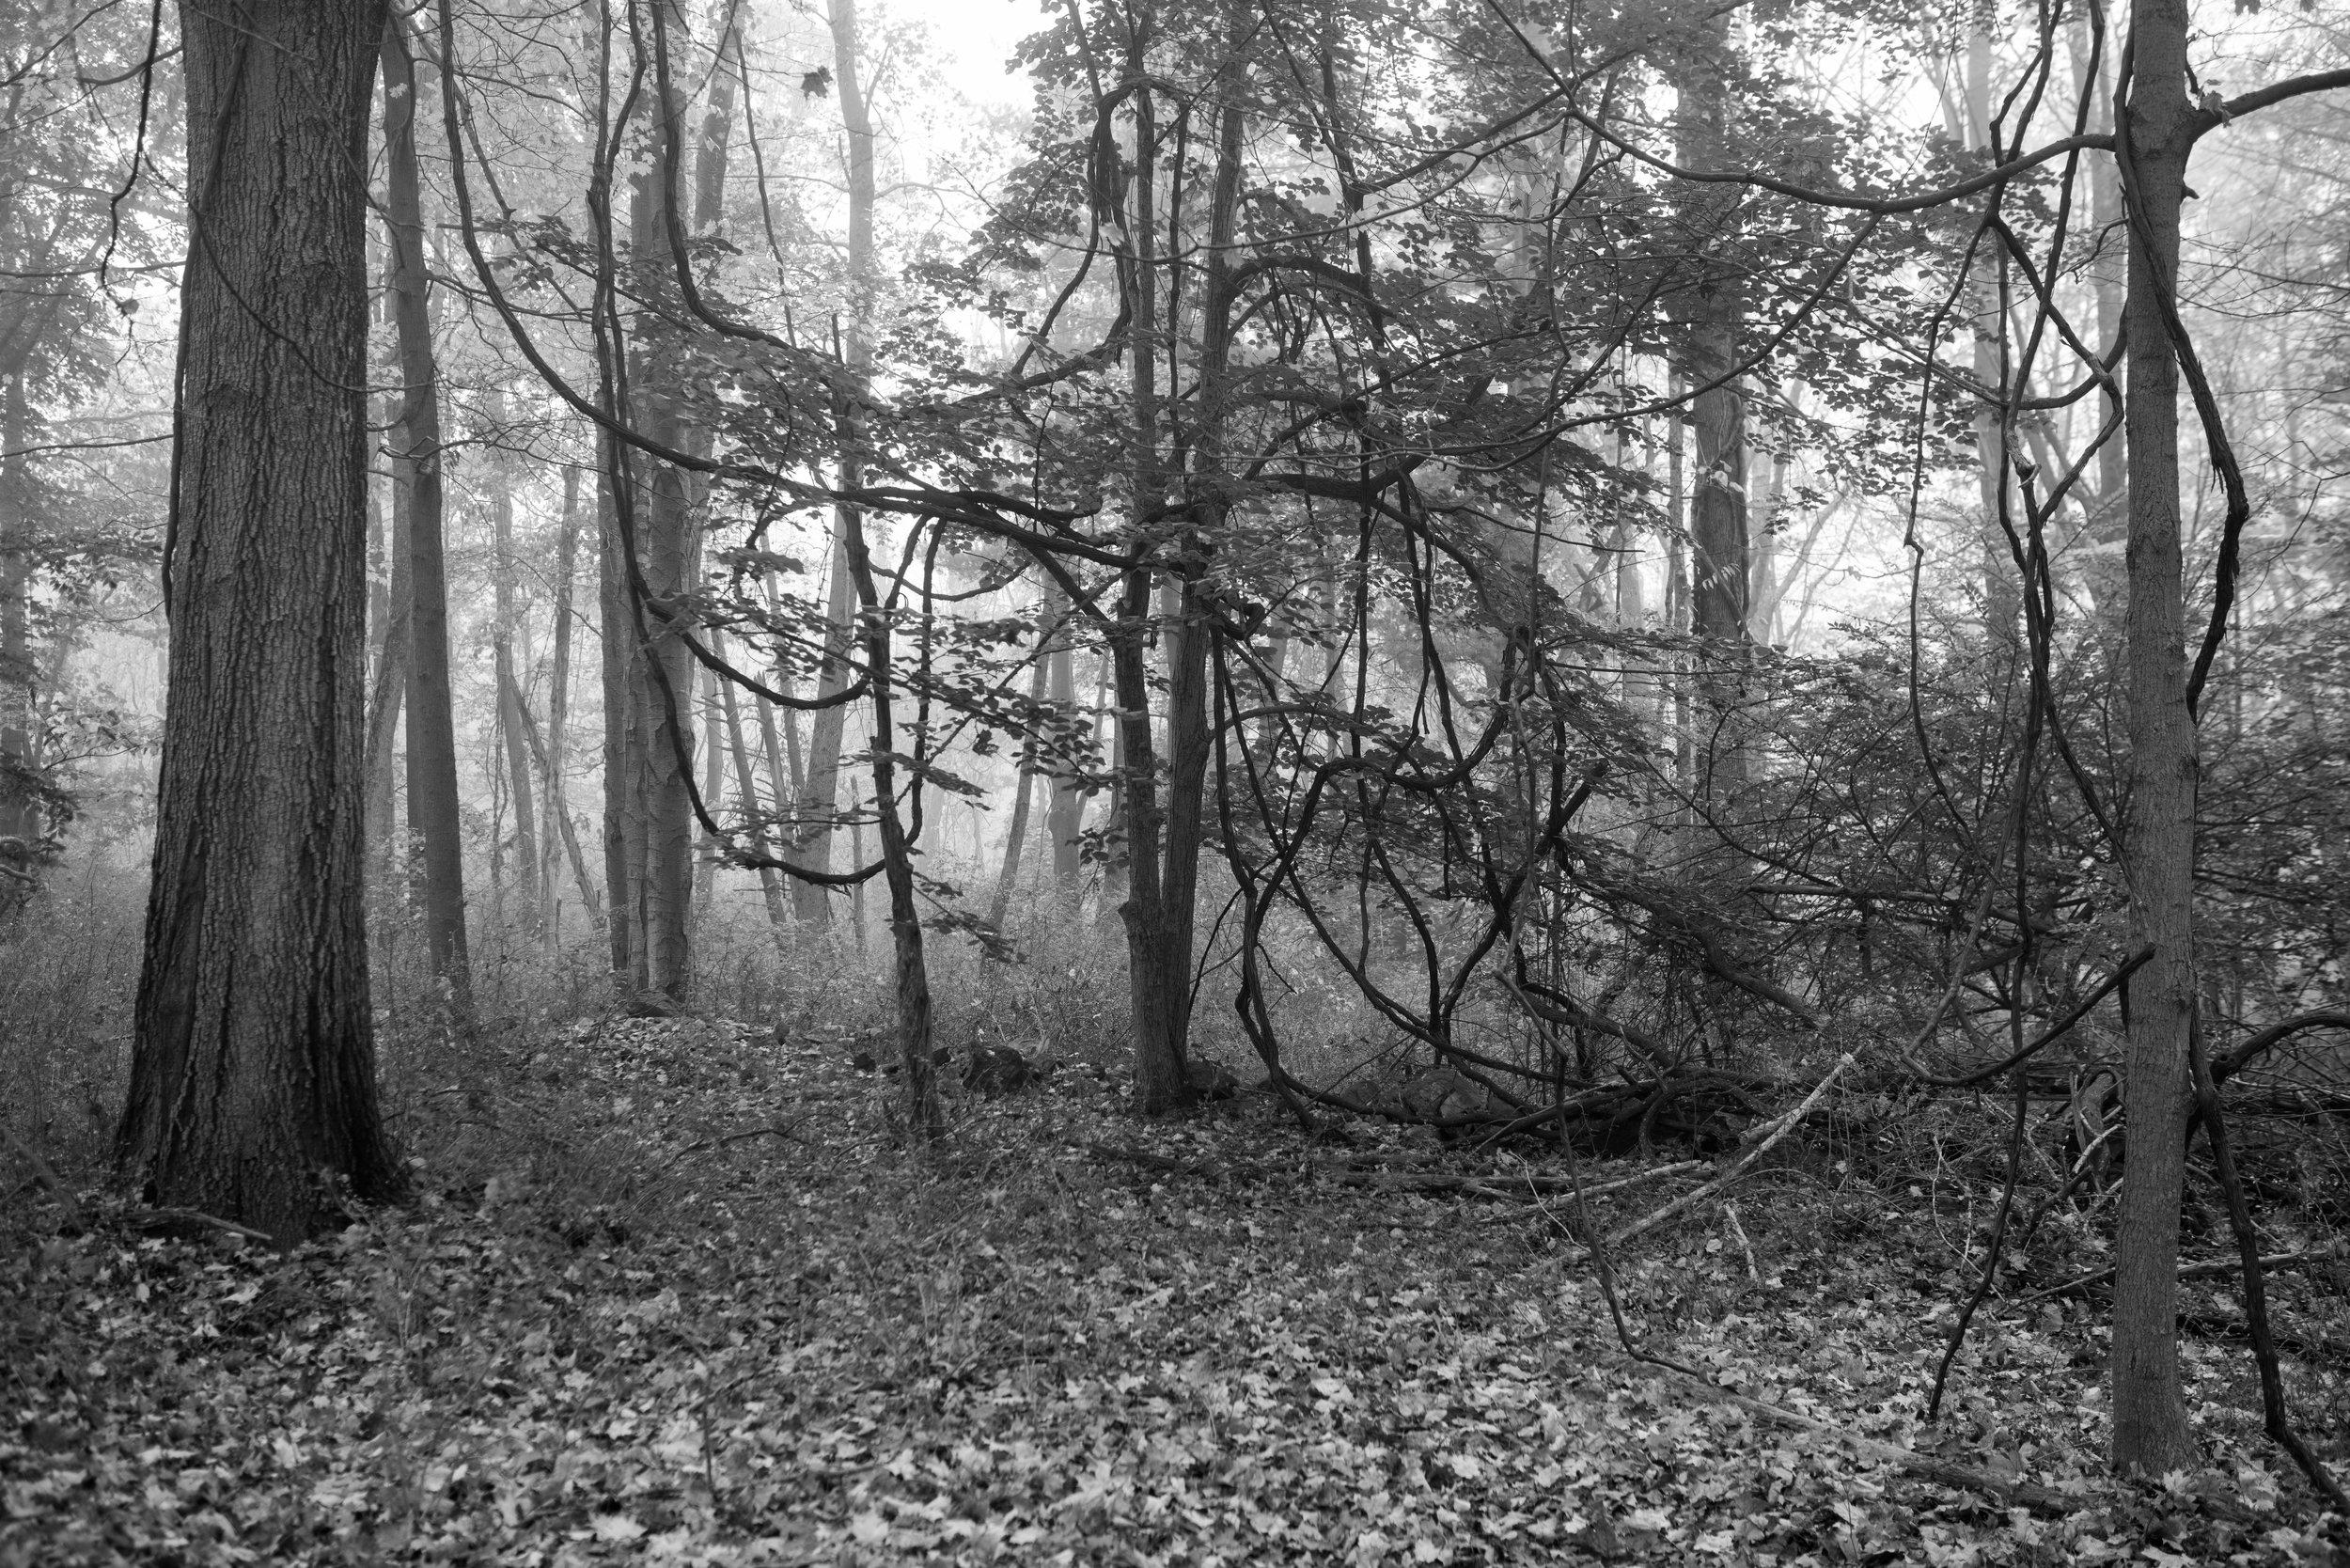 forest_vines_mist.jpg